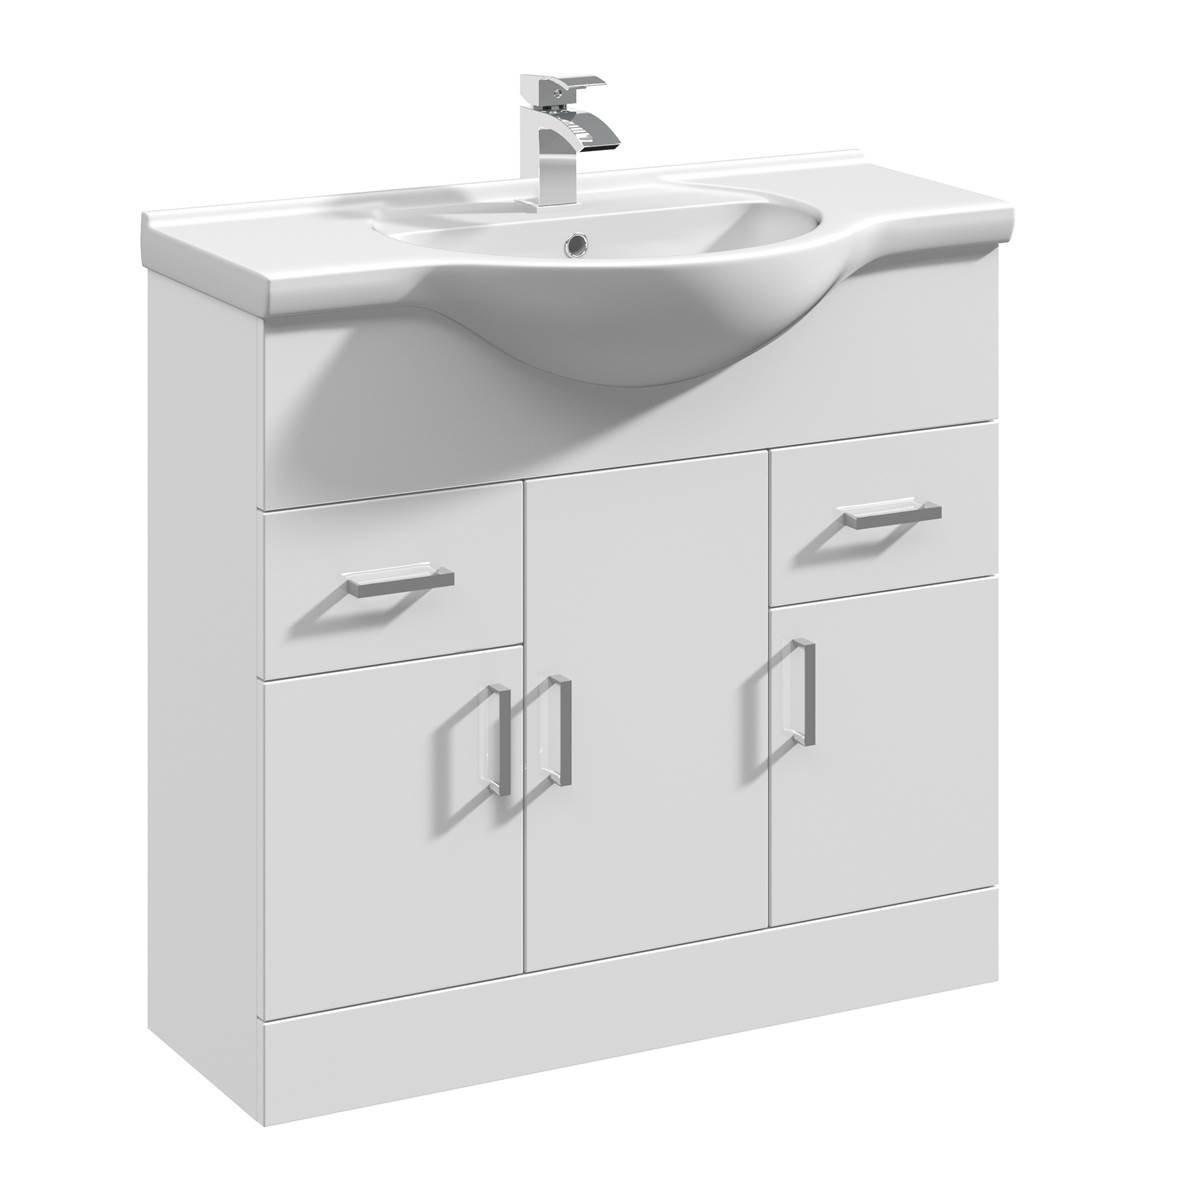 gloss gloss modular bathroom furniture collection. 1450mm Modular High Gloss White Bathroom Combination Vanity Basin Sink Cabinet, WC Toilet Furniture \u0026 BTW Pan: Amazon.co.uk: Kitchen Home Collection